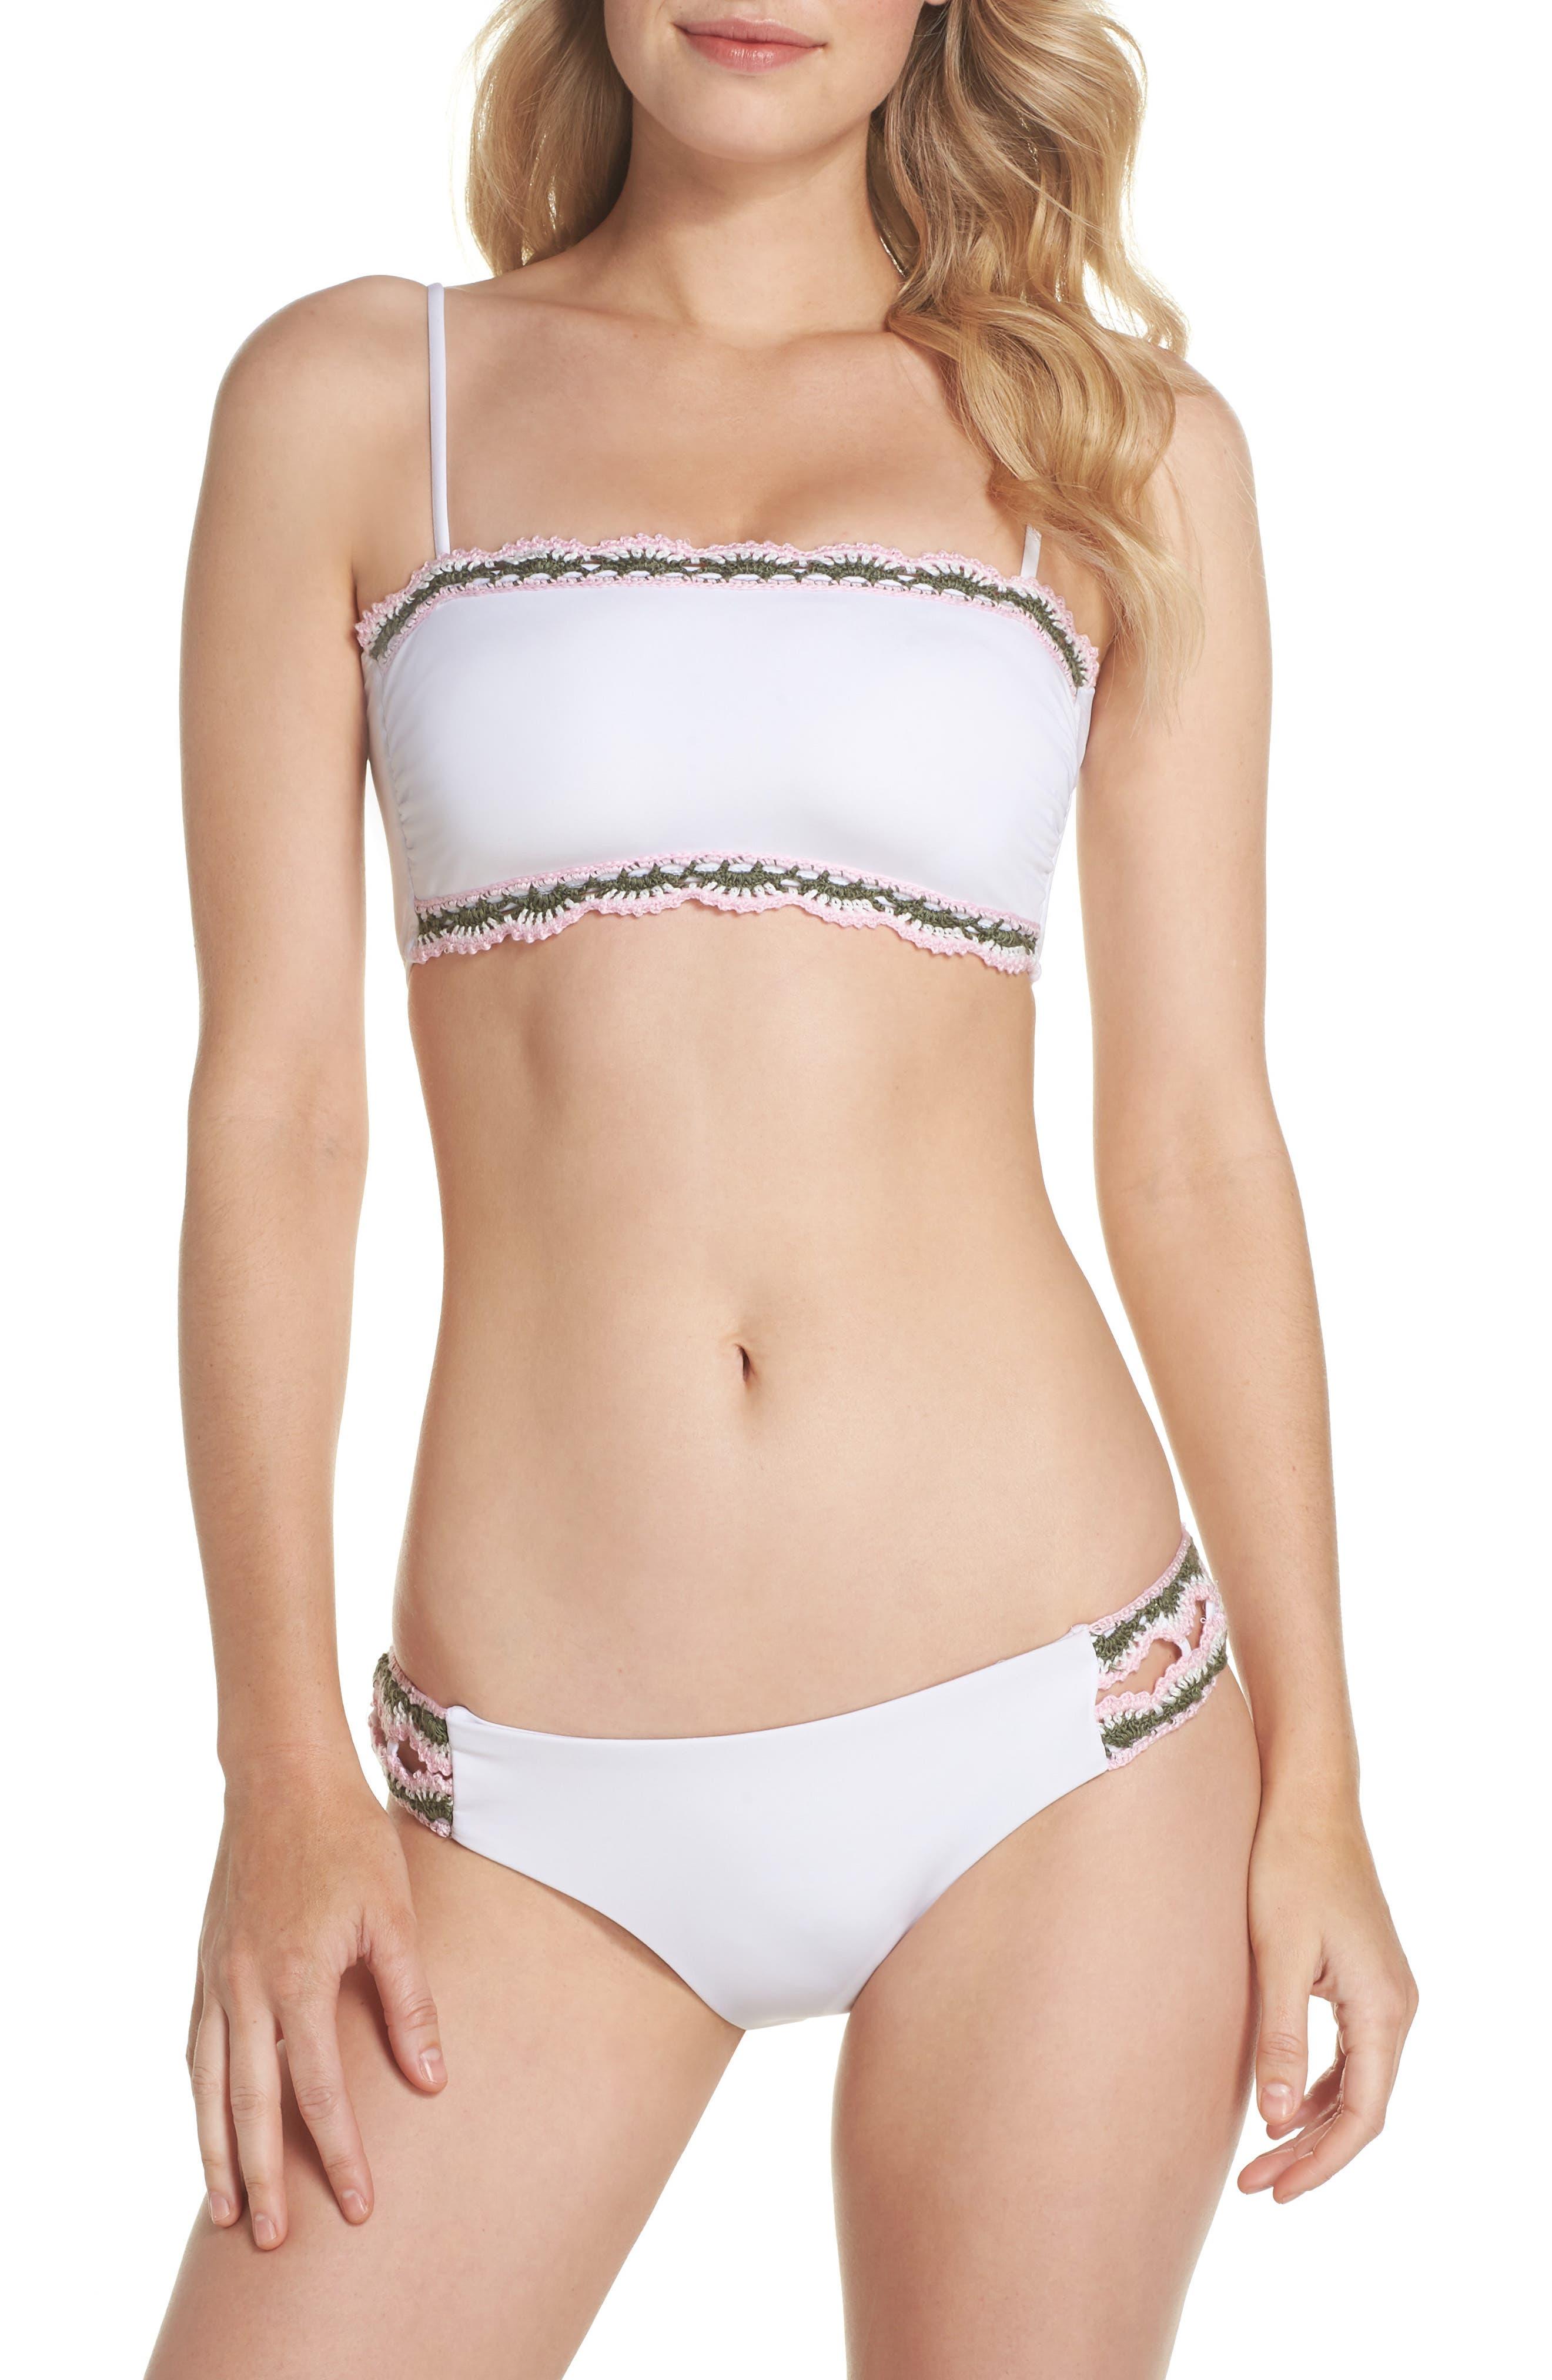 Medina Bandeau Bikini Top,                             Alternate thumbnail 5, color,                             White